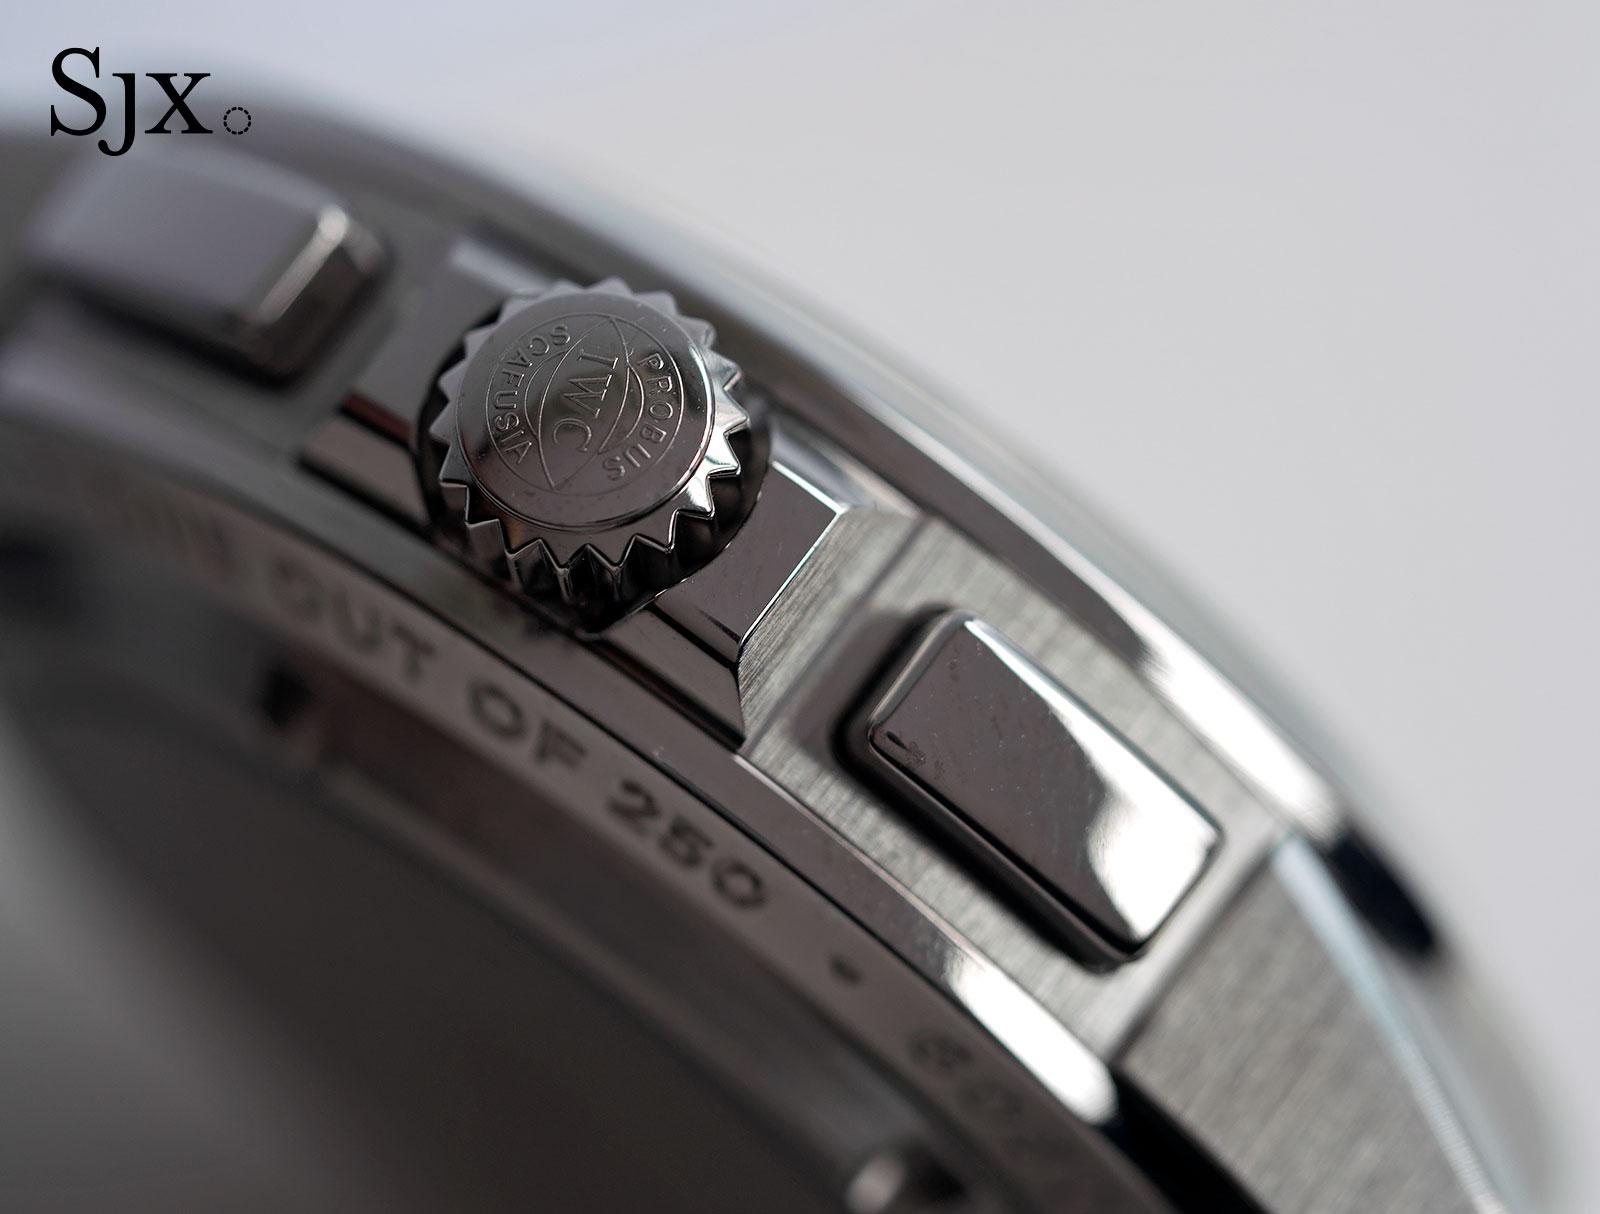 IWC Ingenieur Chronograph 50th Anniversary AMG 4